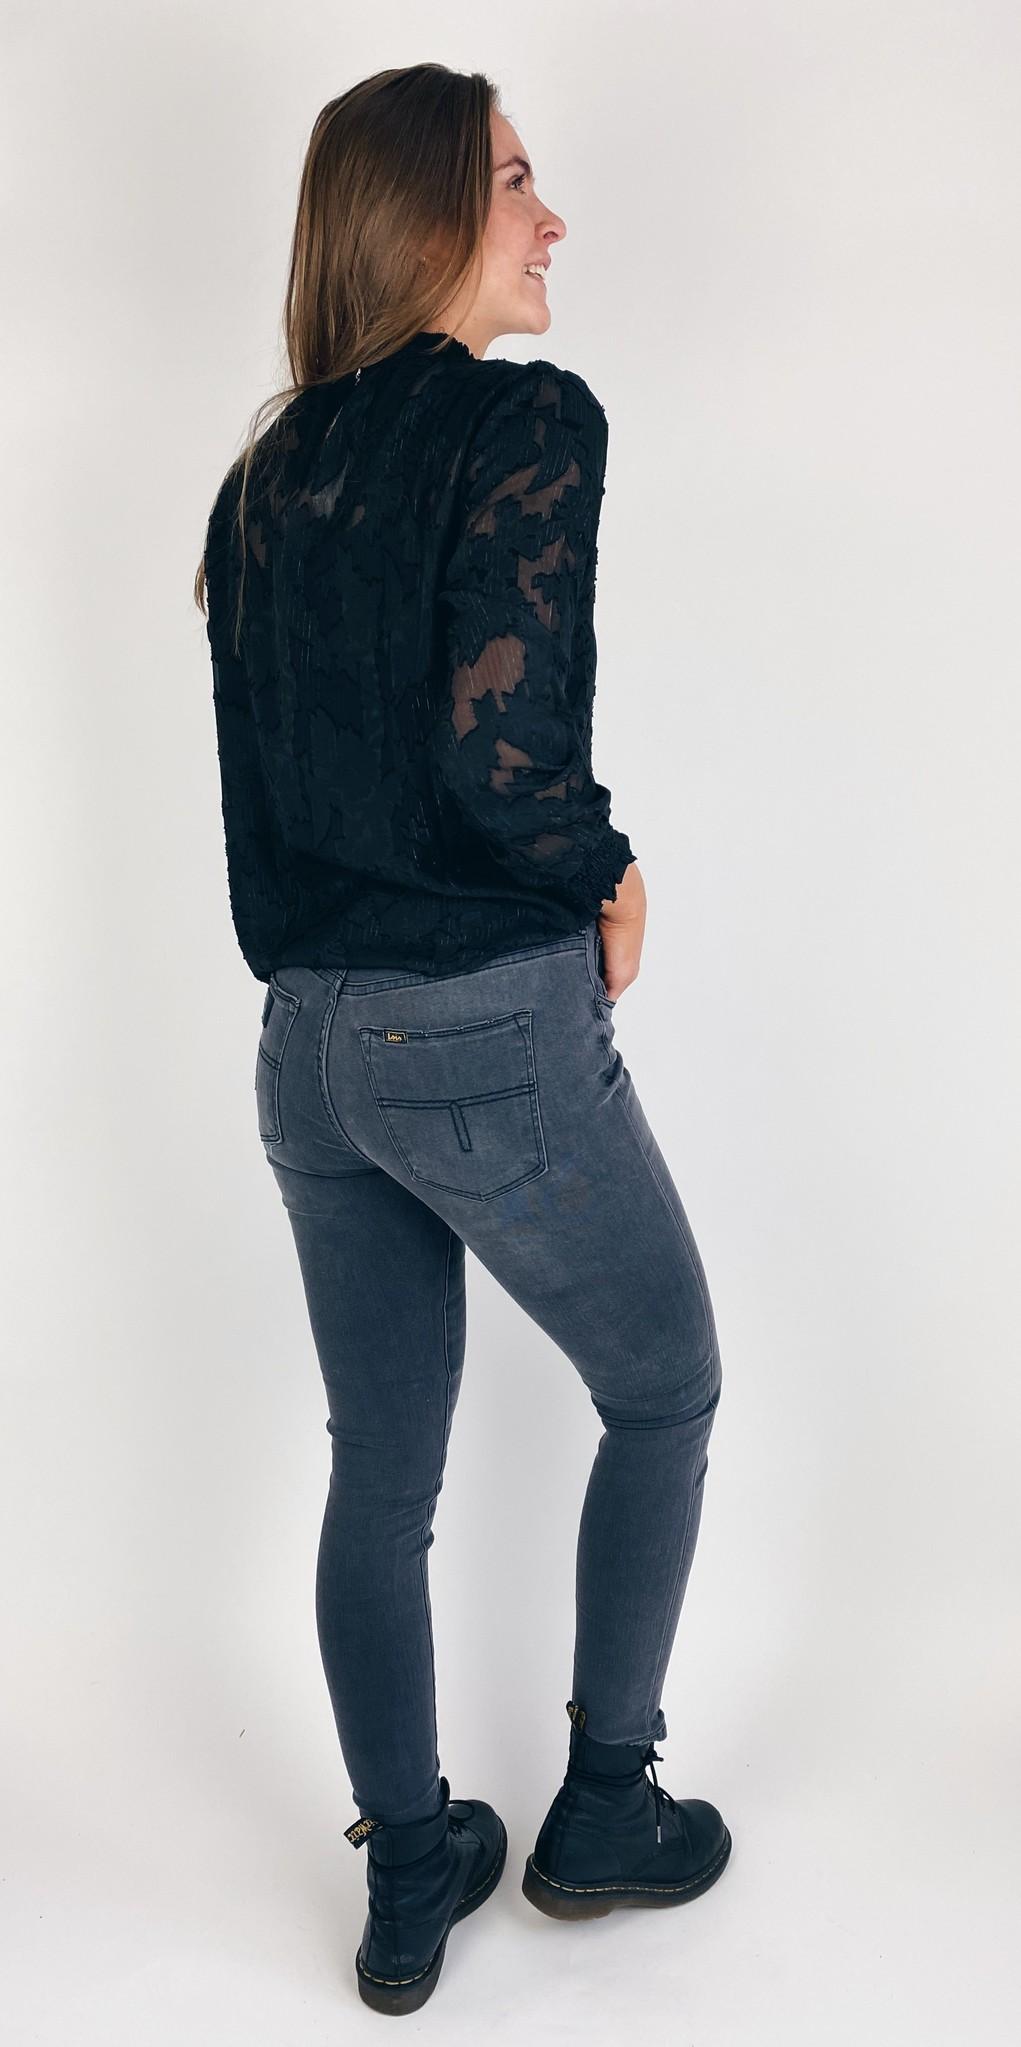 Jeans Celia power black Lengte 34 grey stone-4